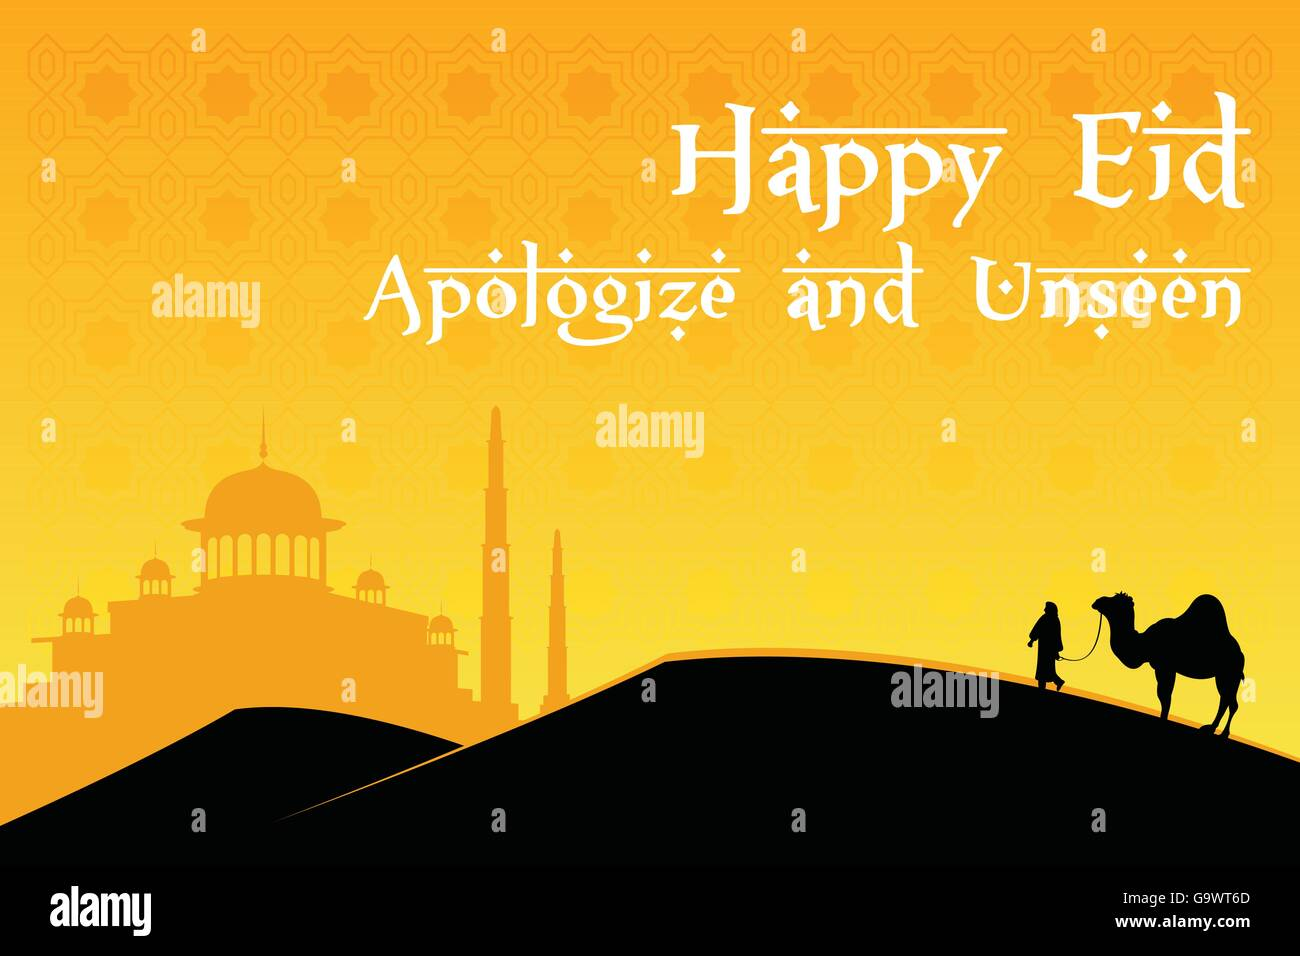 Happy Eid Mubarak Islamic Greetings With Mosque Background Stock